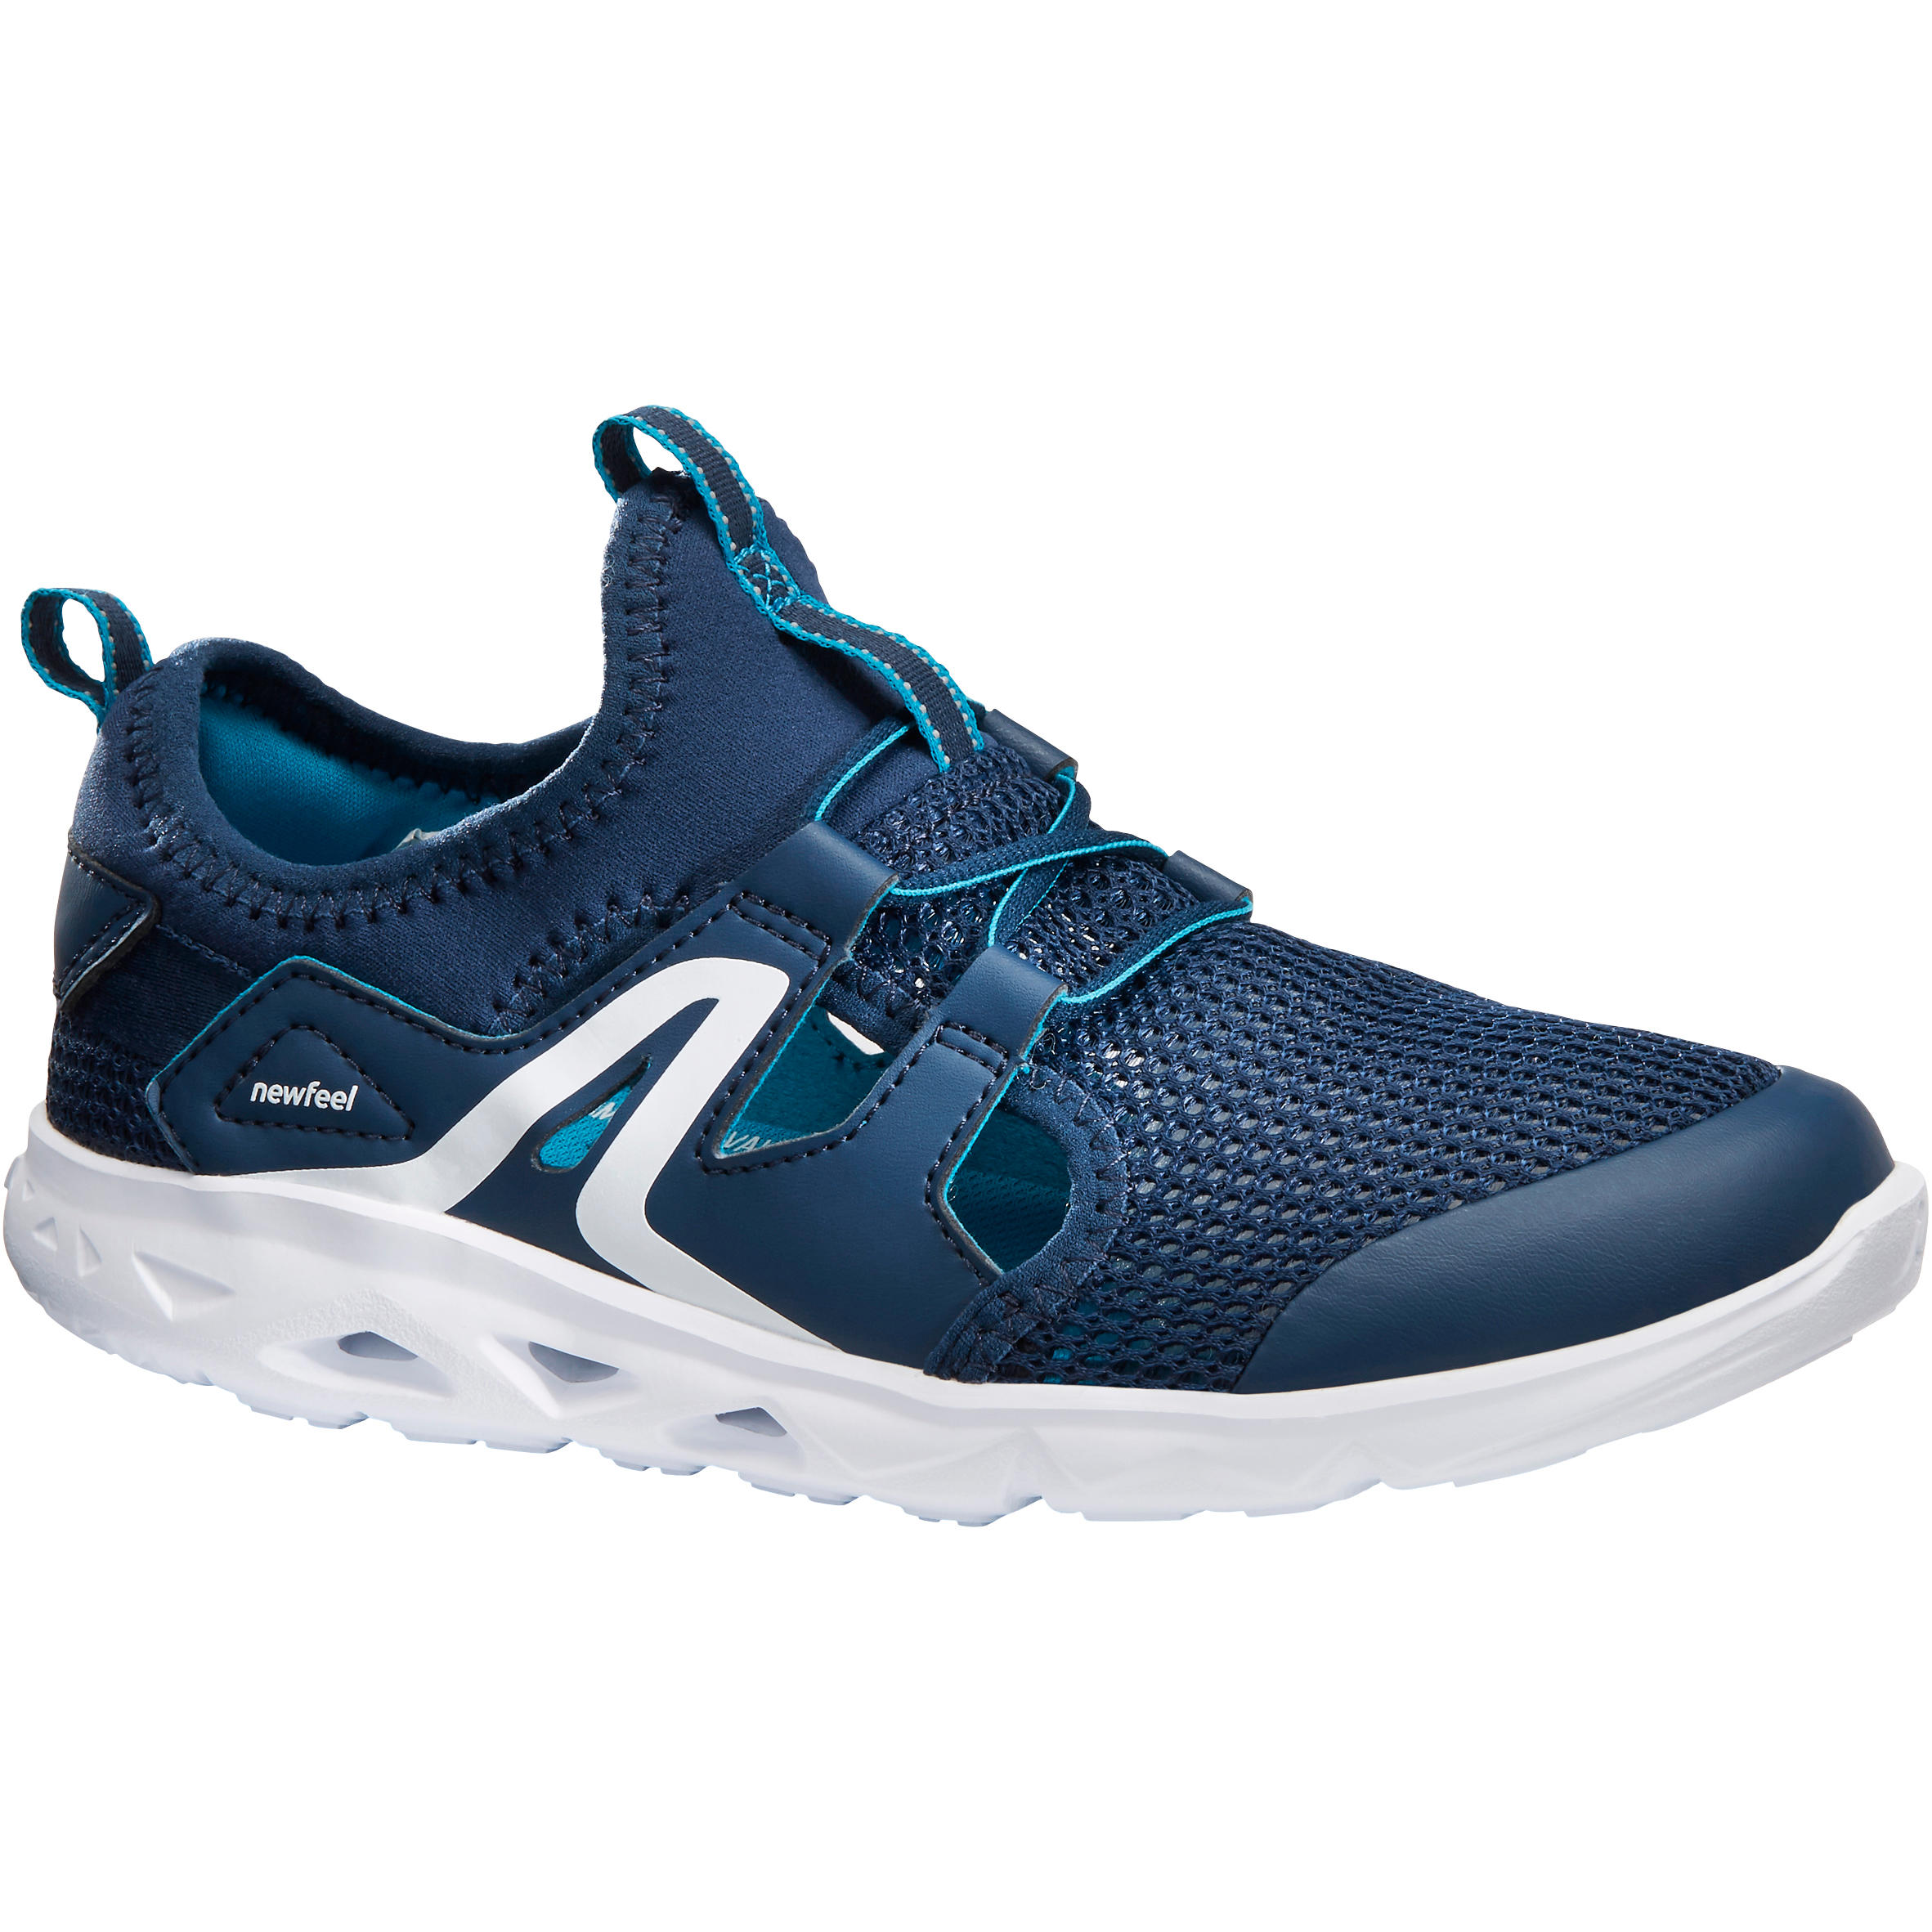 Tenis de caminata deportiva para niños PW 500 Fresh azul marino